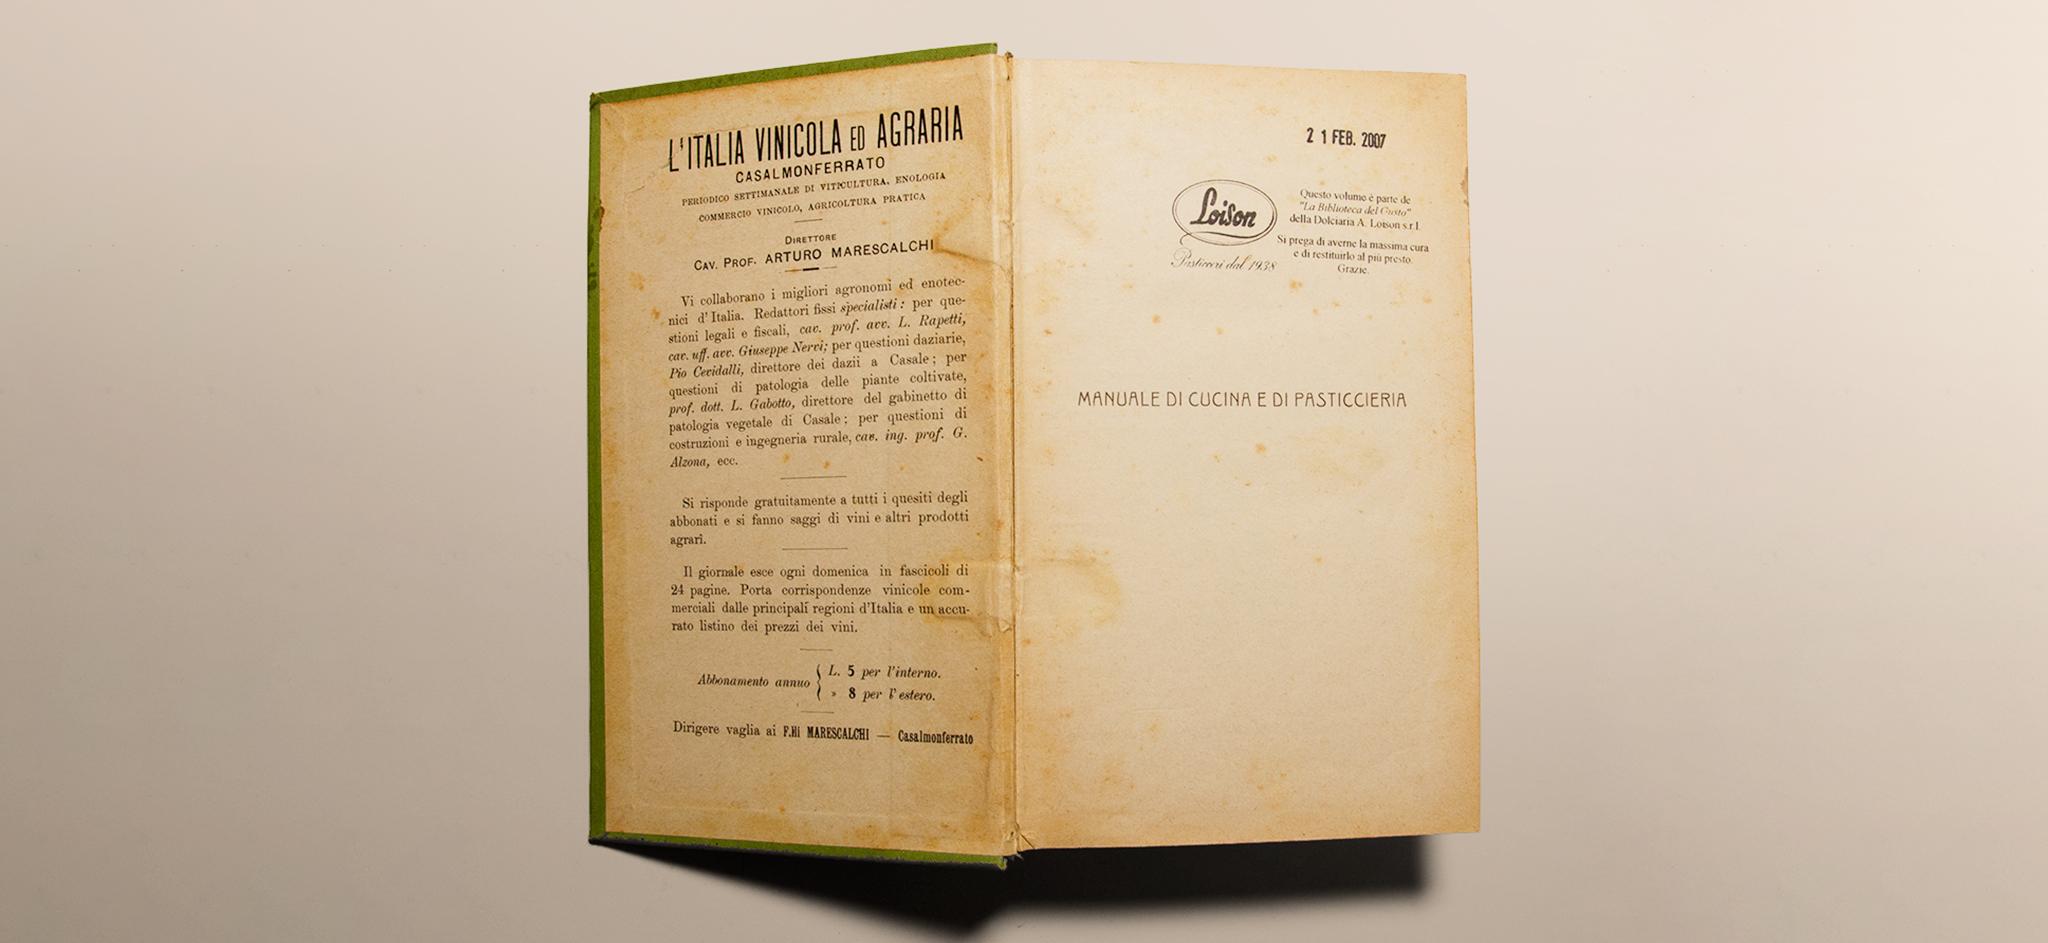 Manuale di cucina e pasticceria di Amedeo Pettini - Loison ...